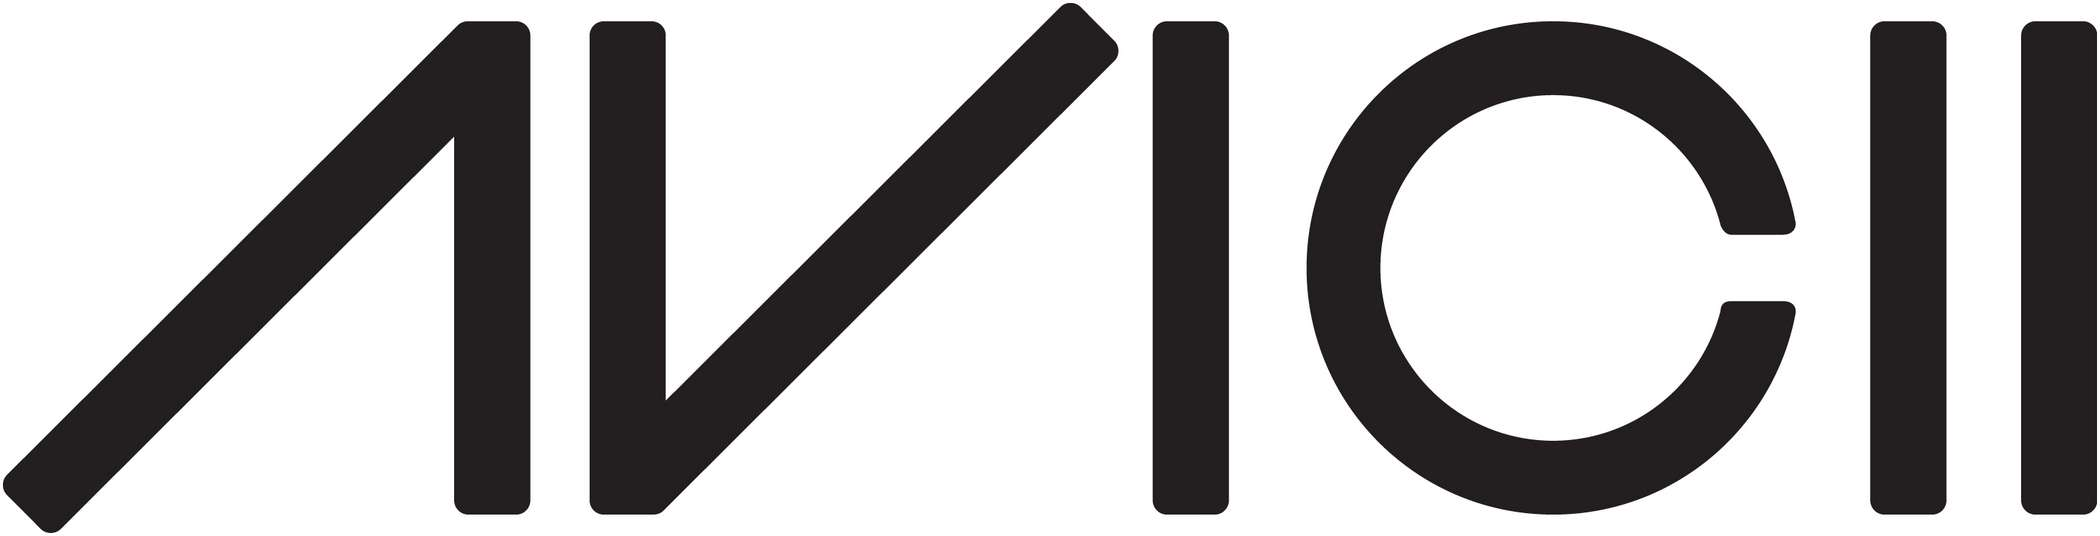 Avicii-logo